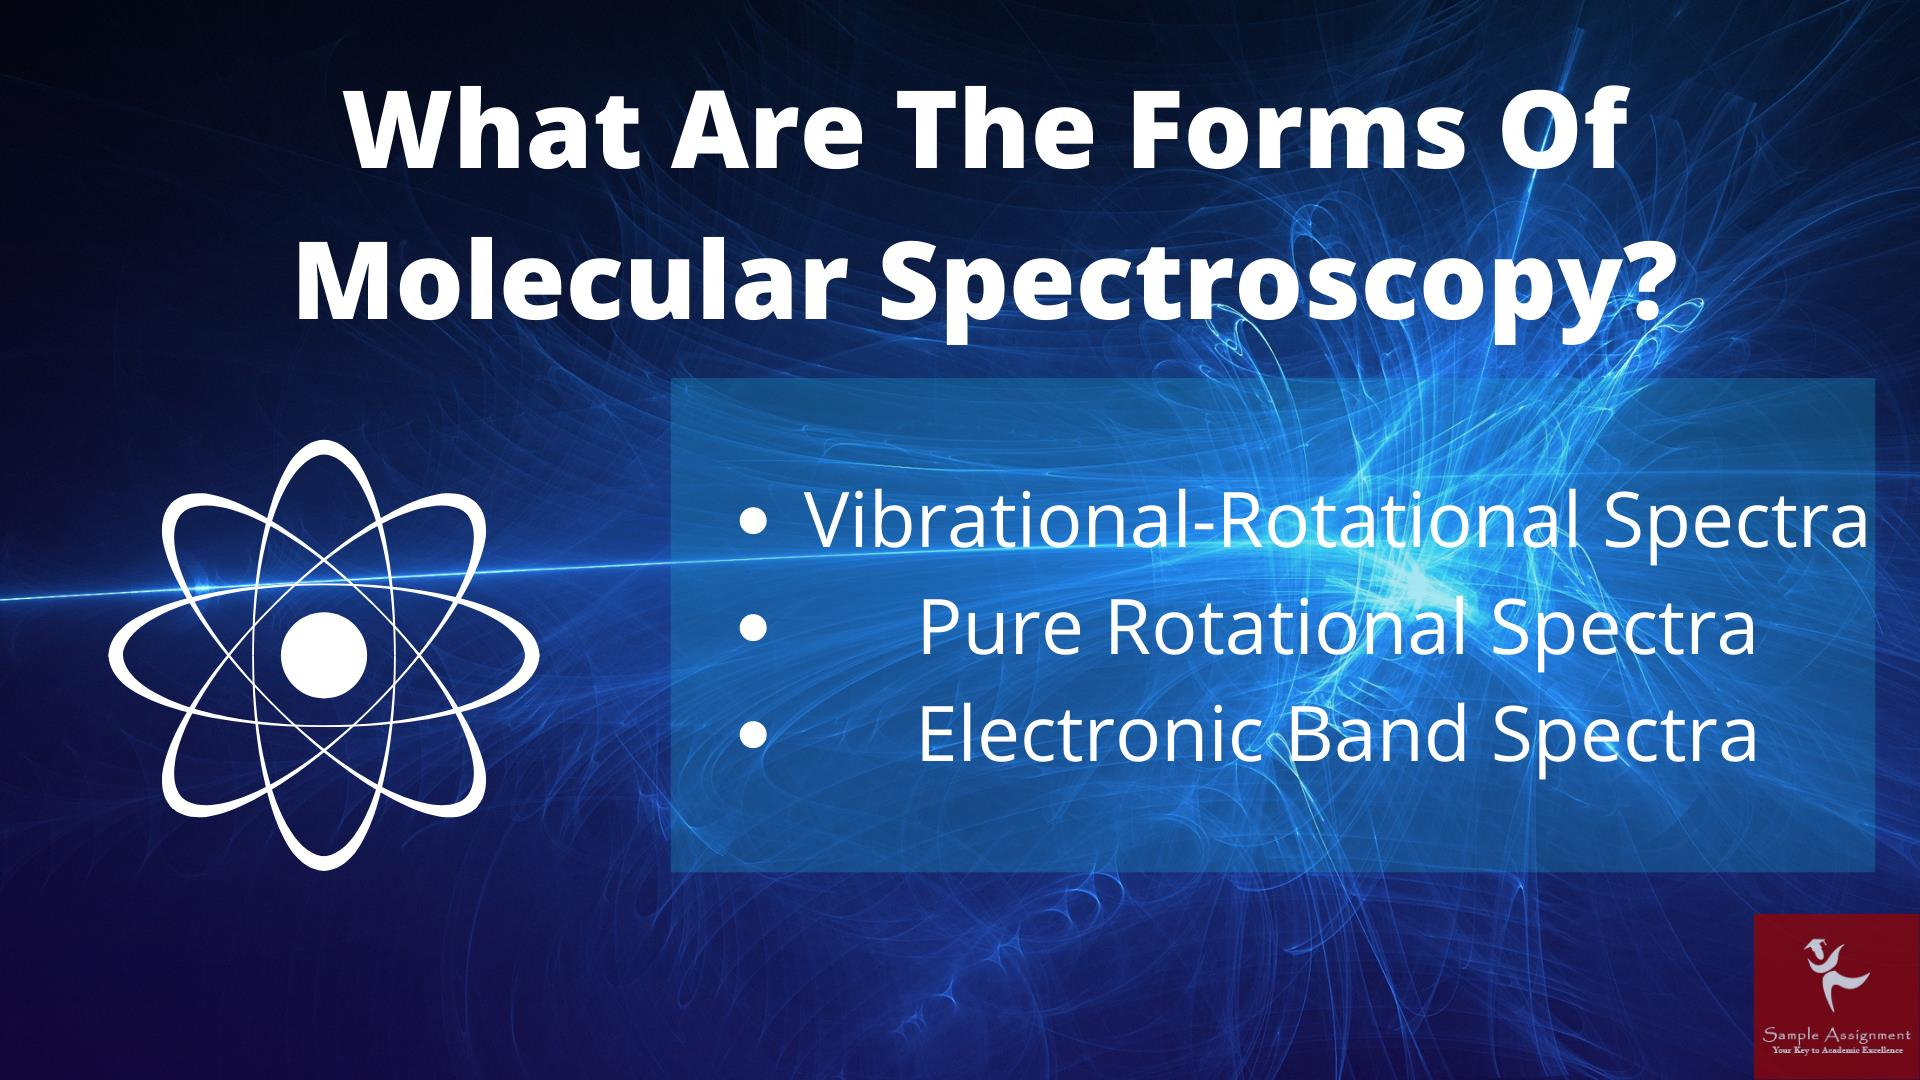 molecular spectroscopy academic assistance through online tutoring canada